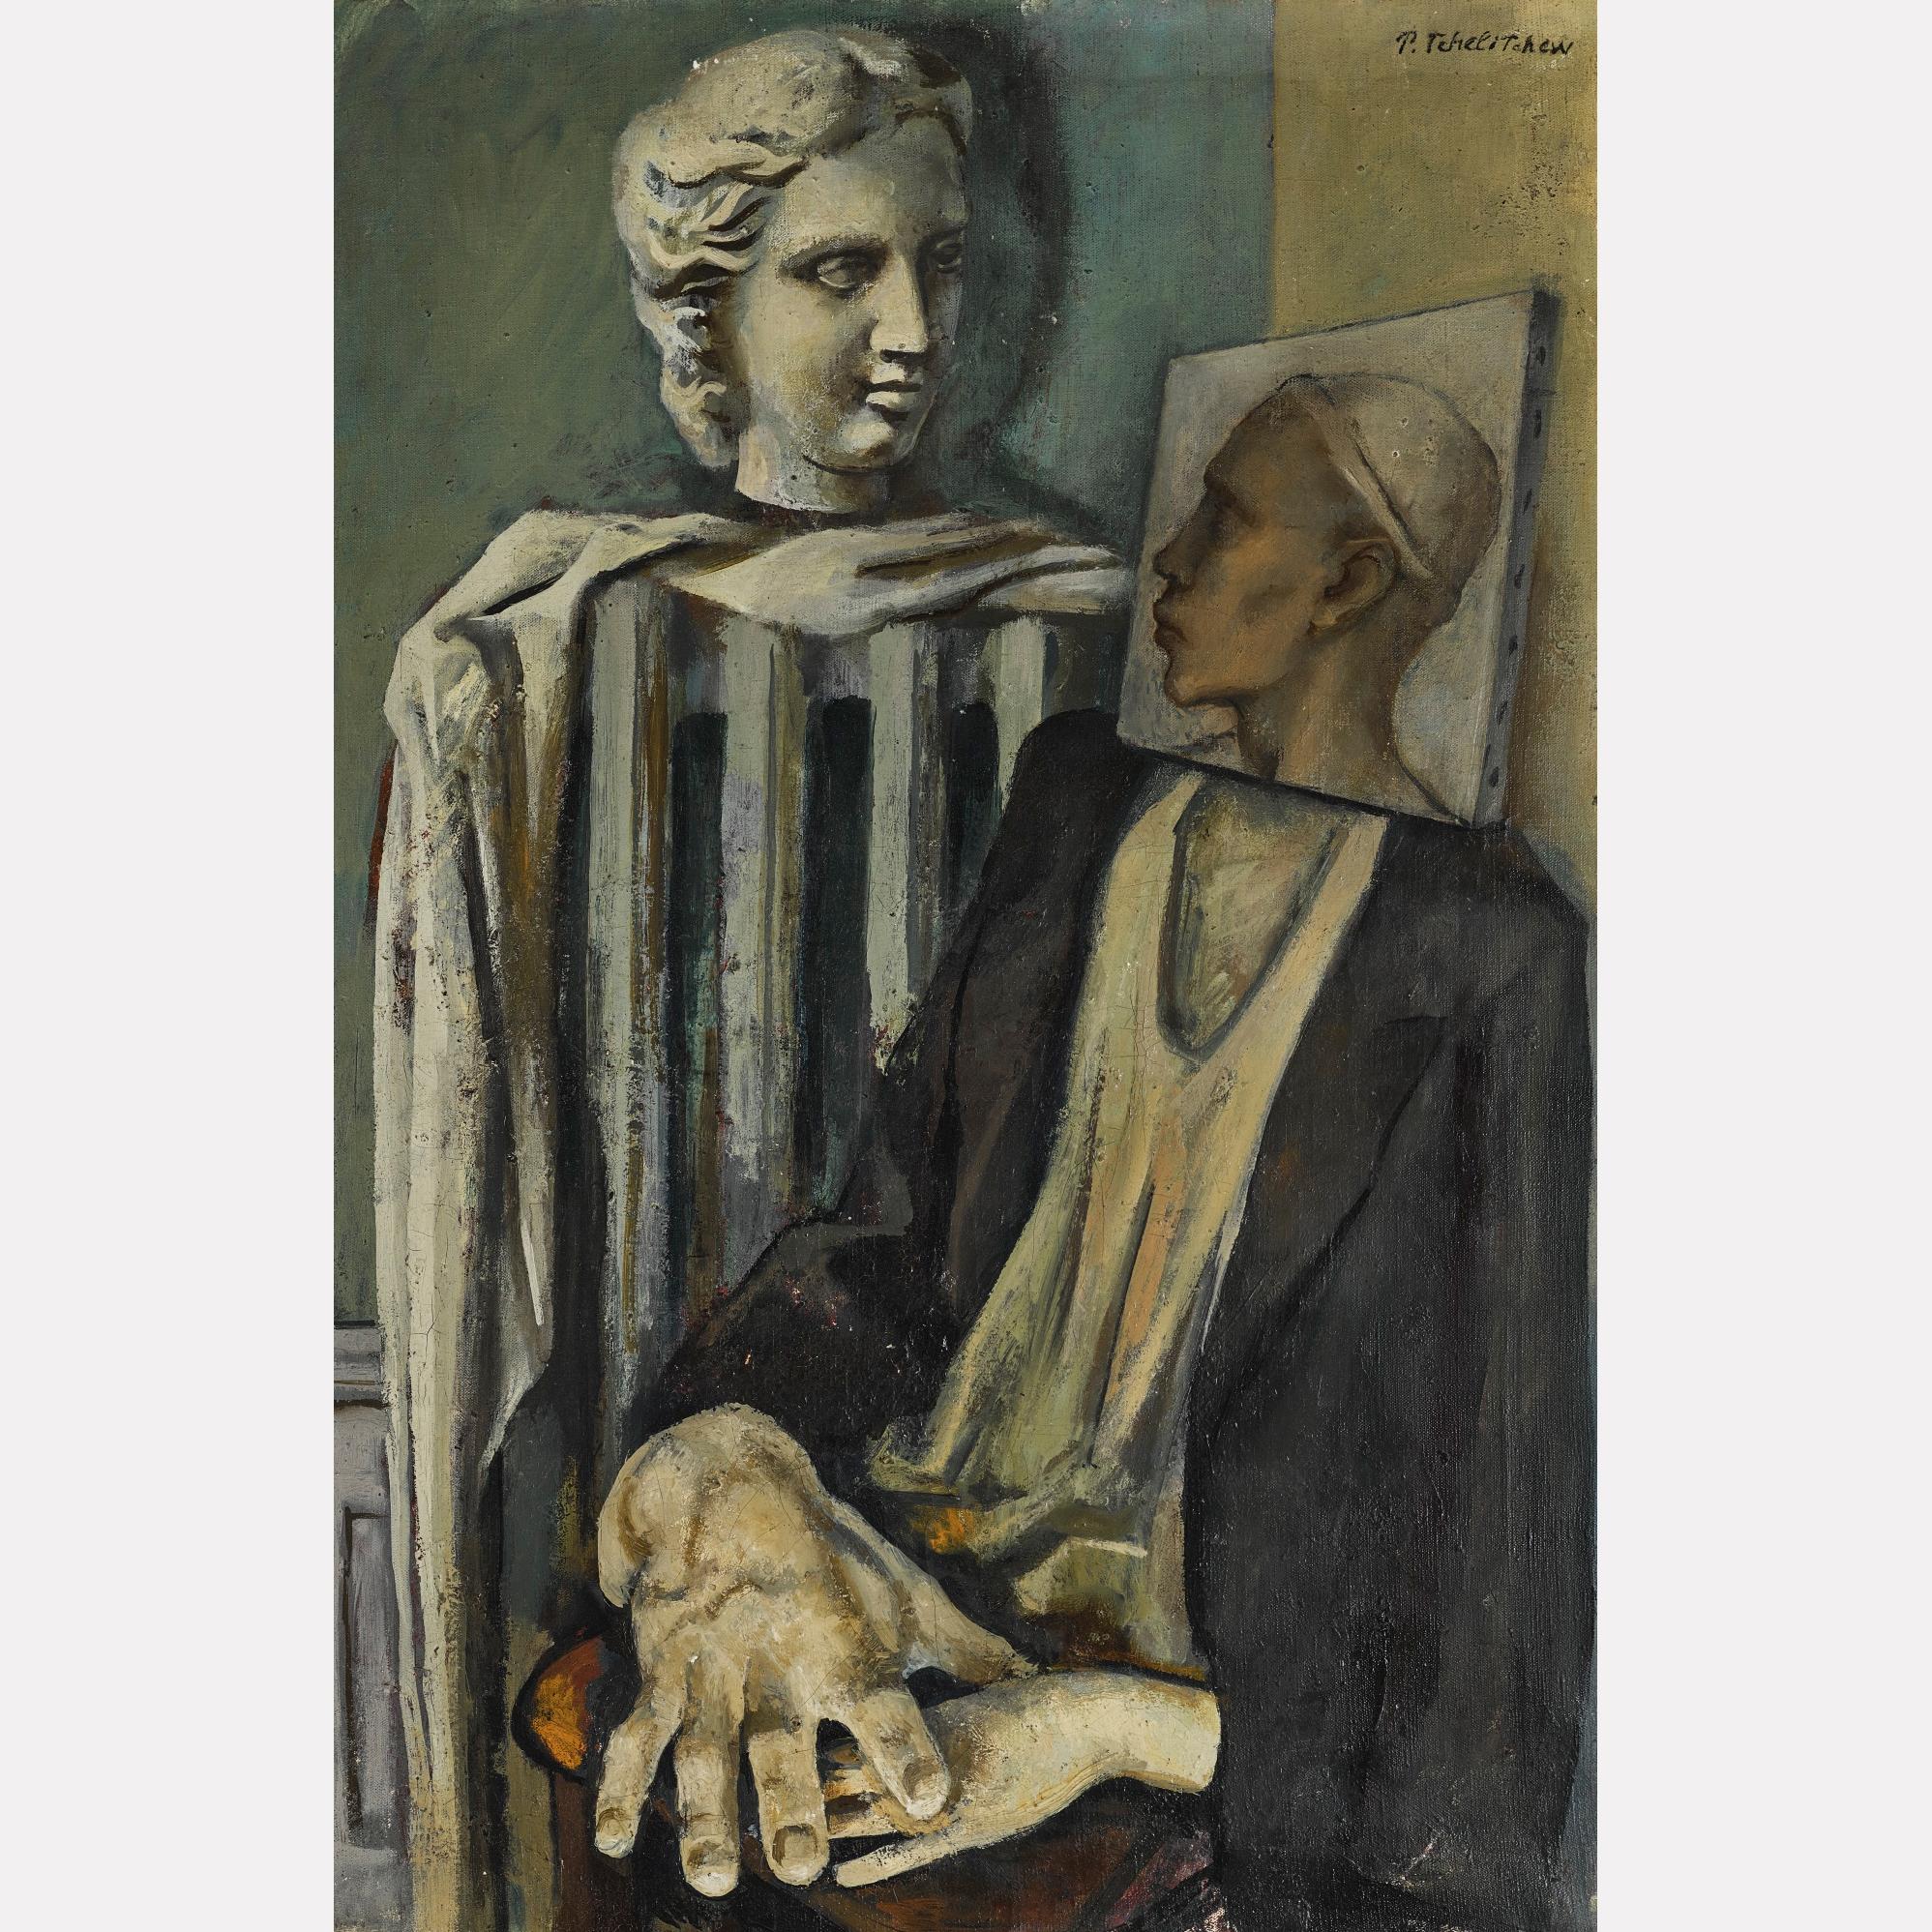 Павел Челищев. Портрет-натюрморт, нач. 1930-х